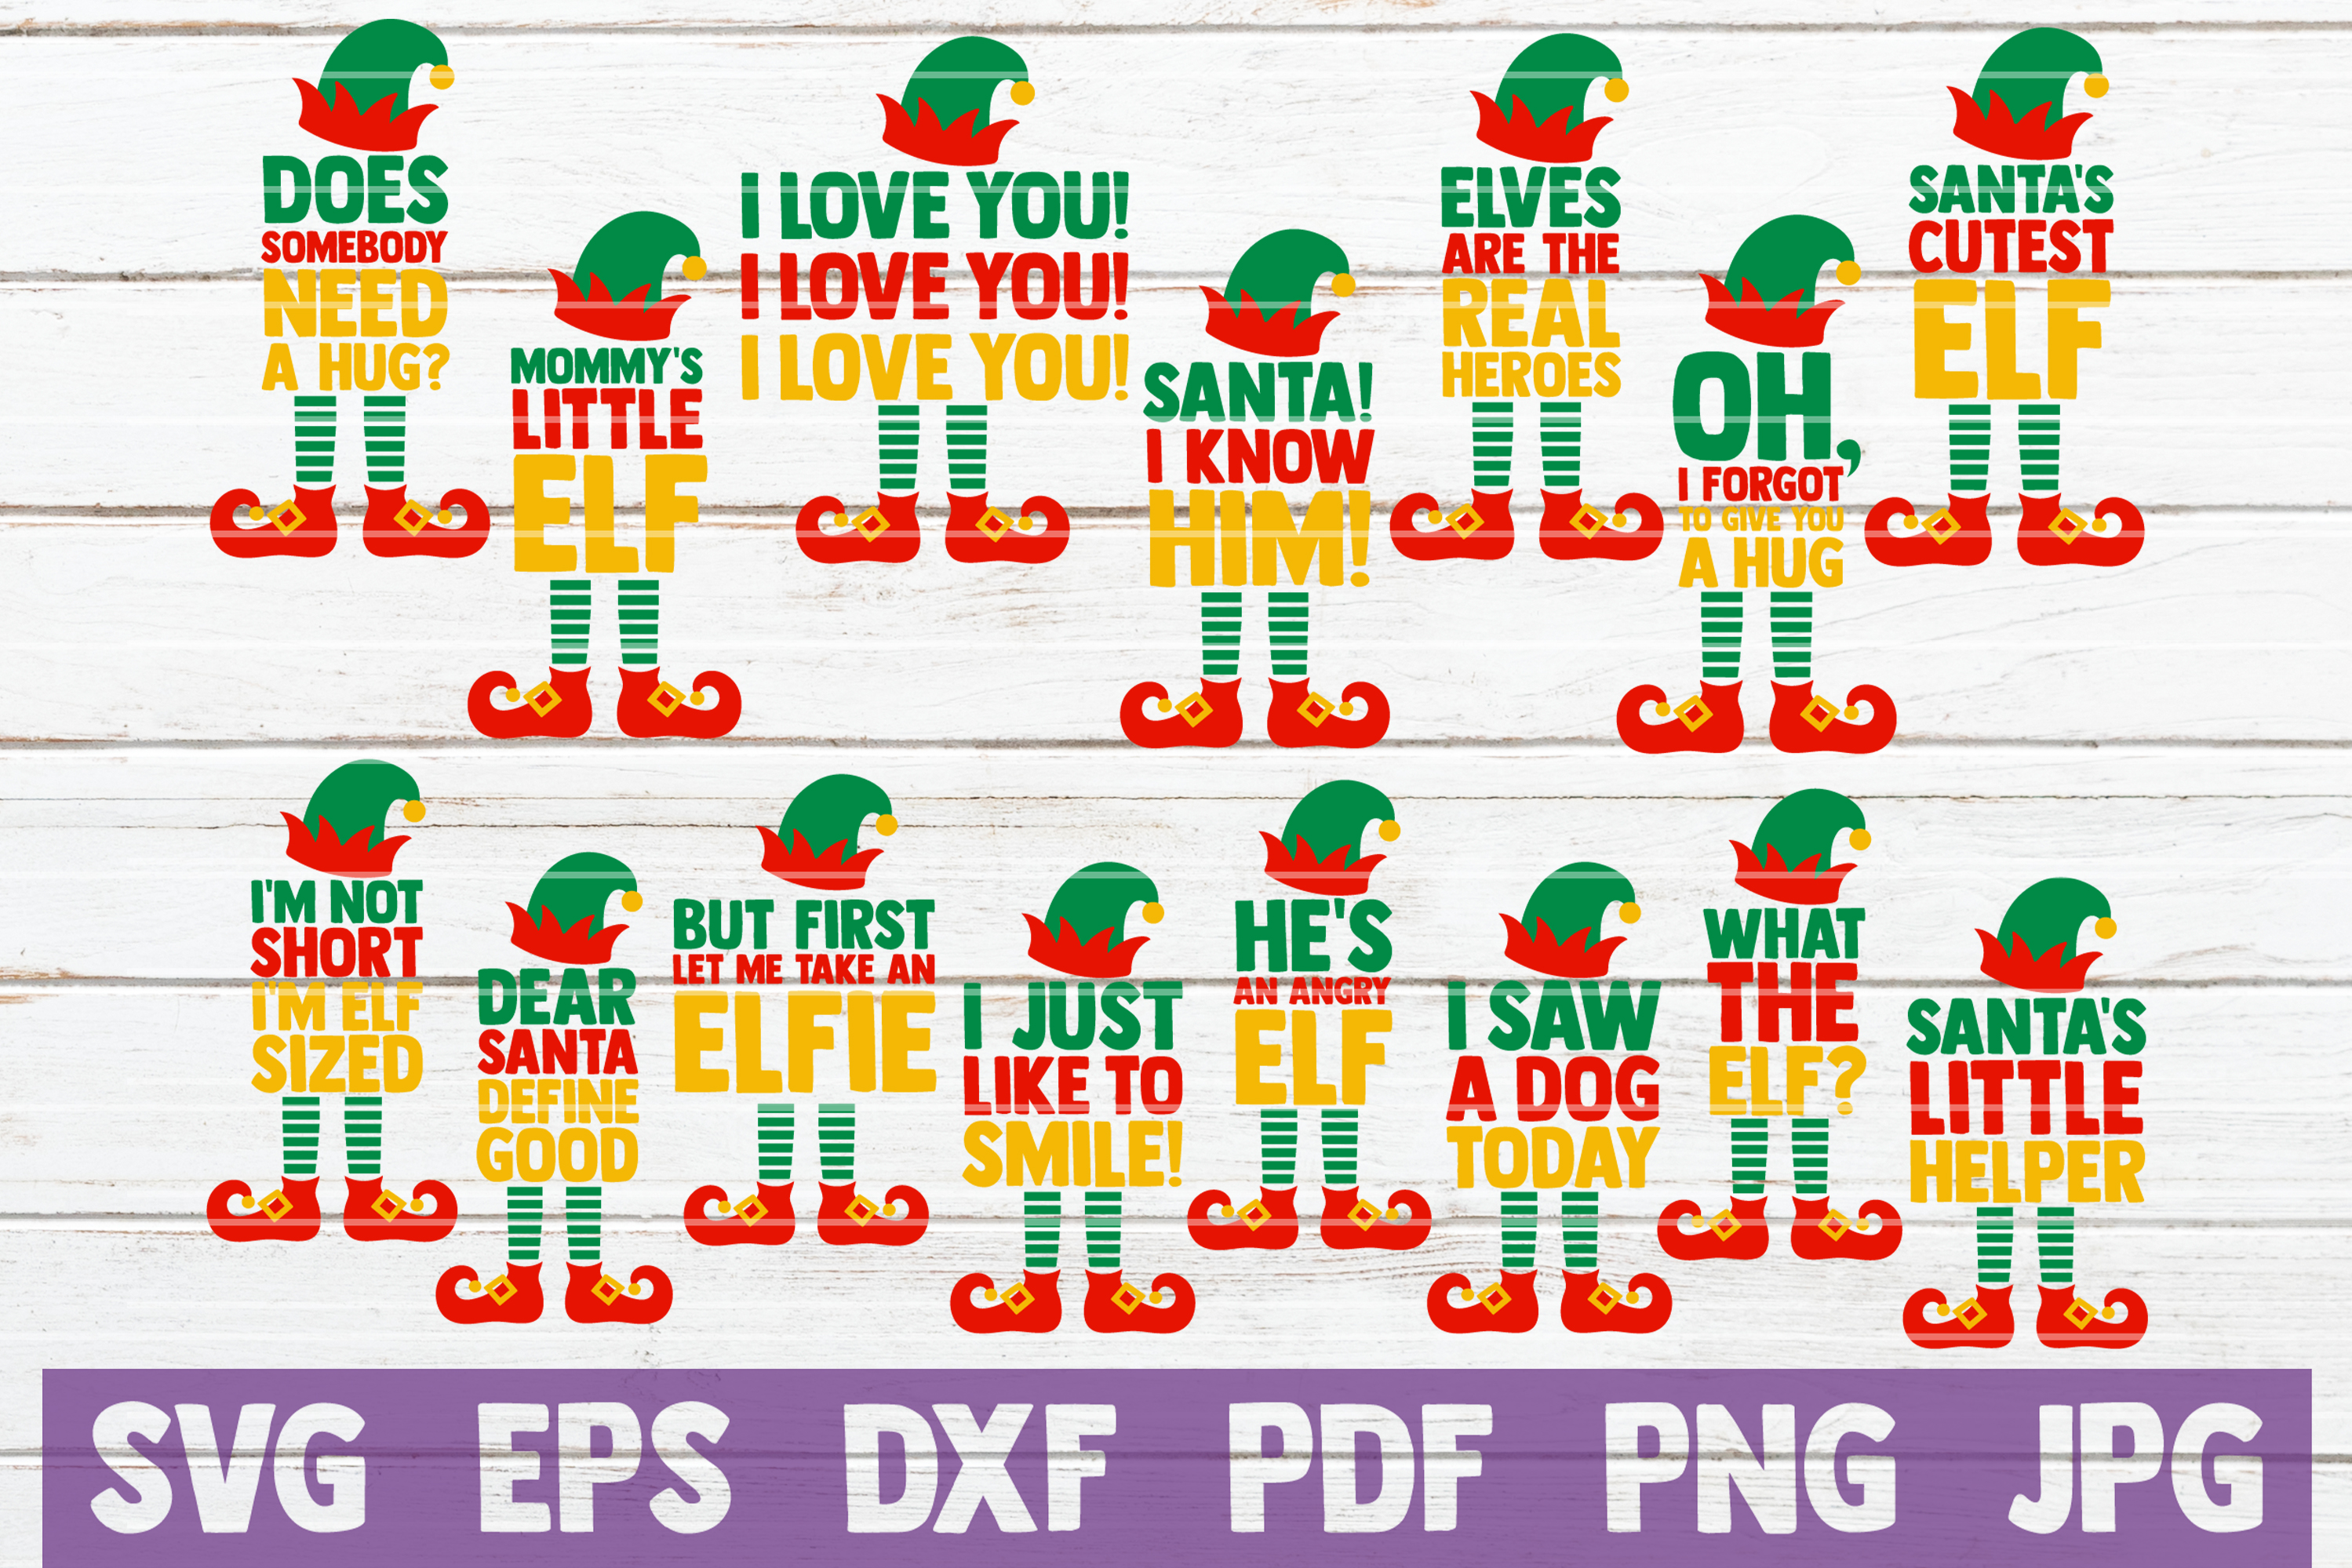 HUGE Christmas SVG Bundle |100 Holiday Designs SVG Cut Files example image 6